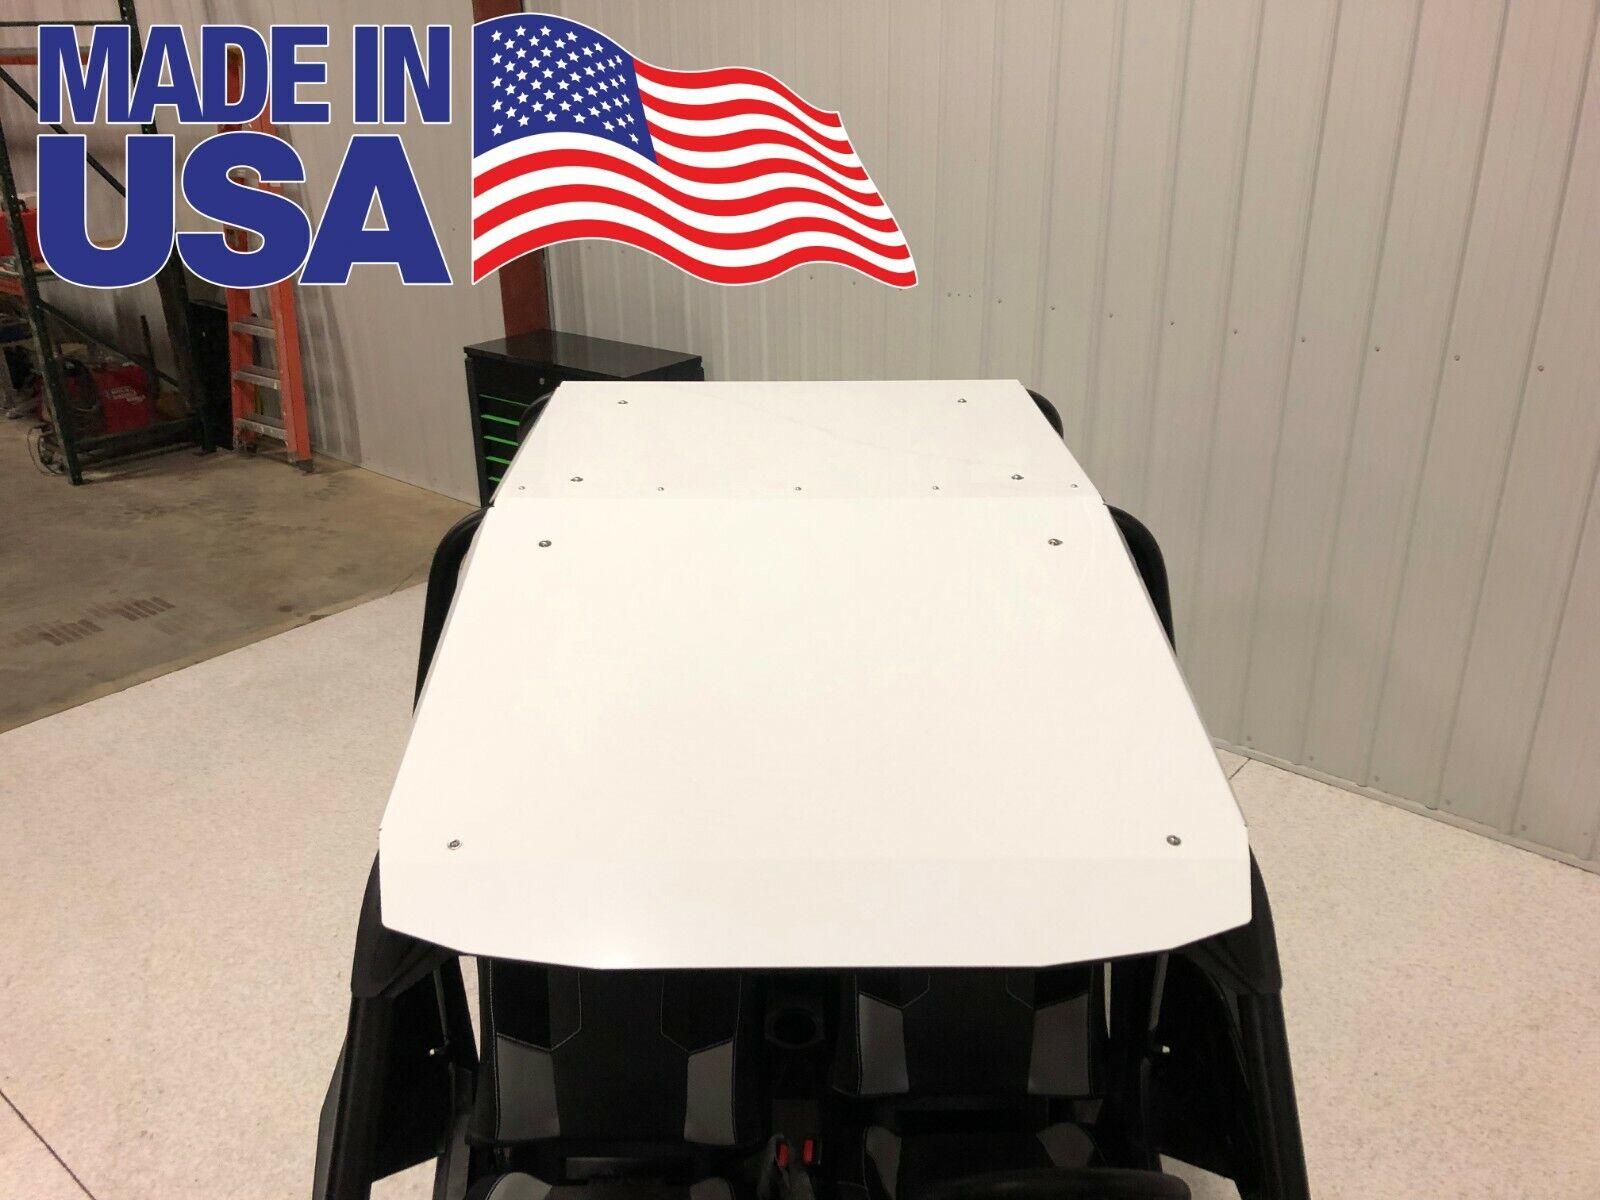 POLARIS RZR4 4 SEATER CREW 900 1000 XP TURBO Roof - WHITE Aluminum USA Made